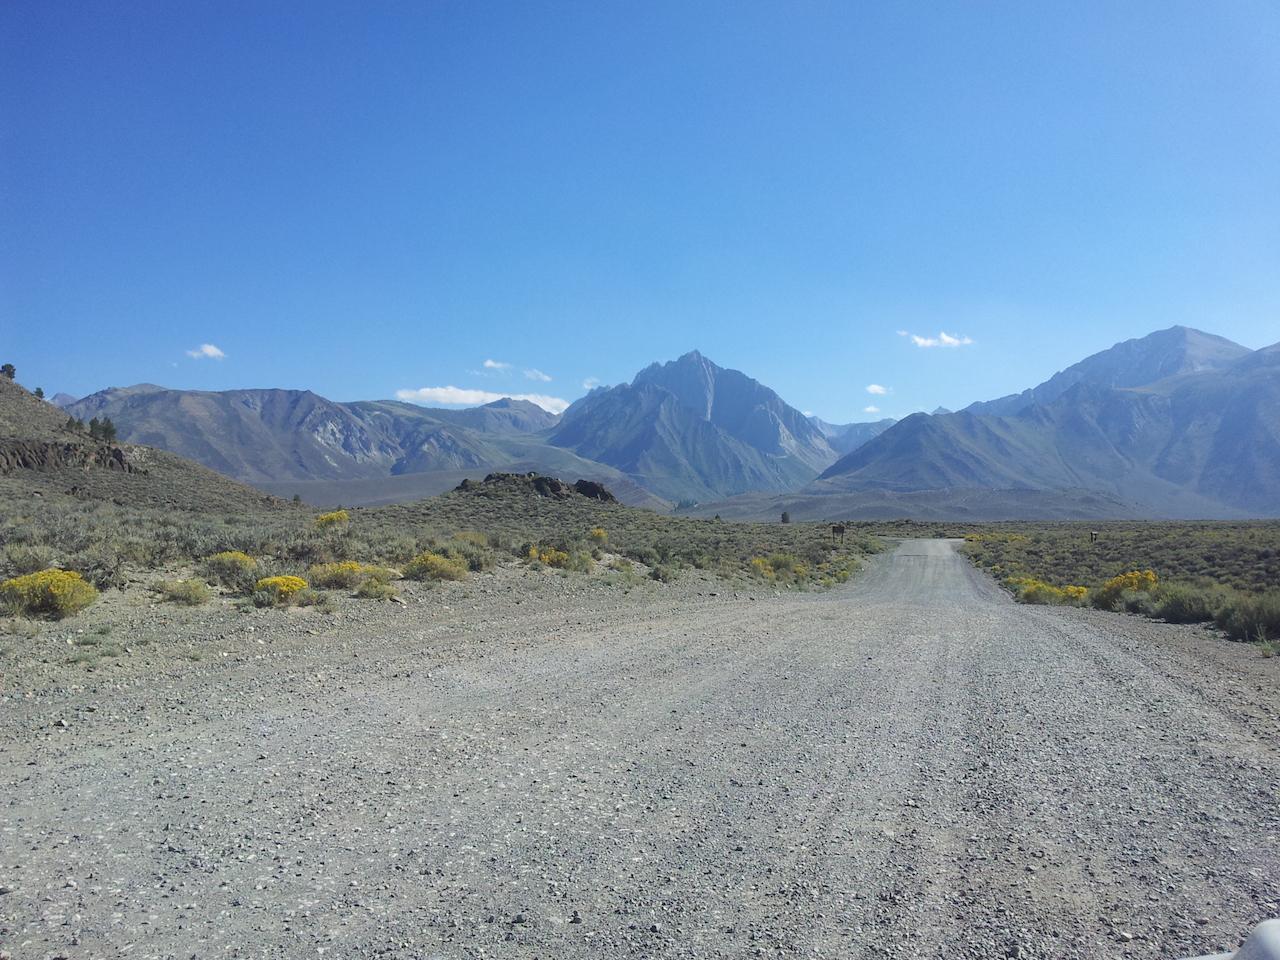 Silnice v poušti - na obzoru Sierras